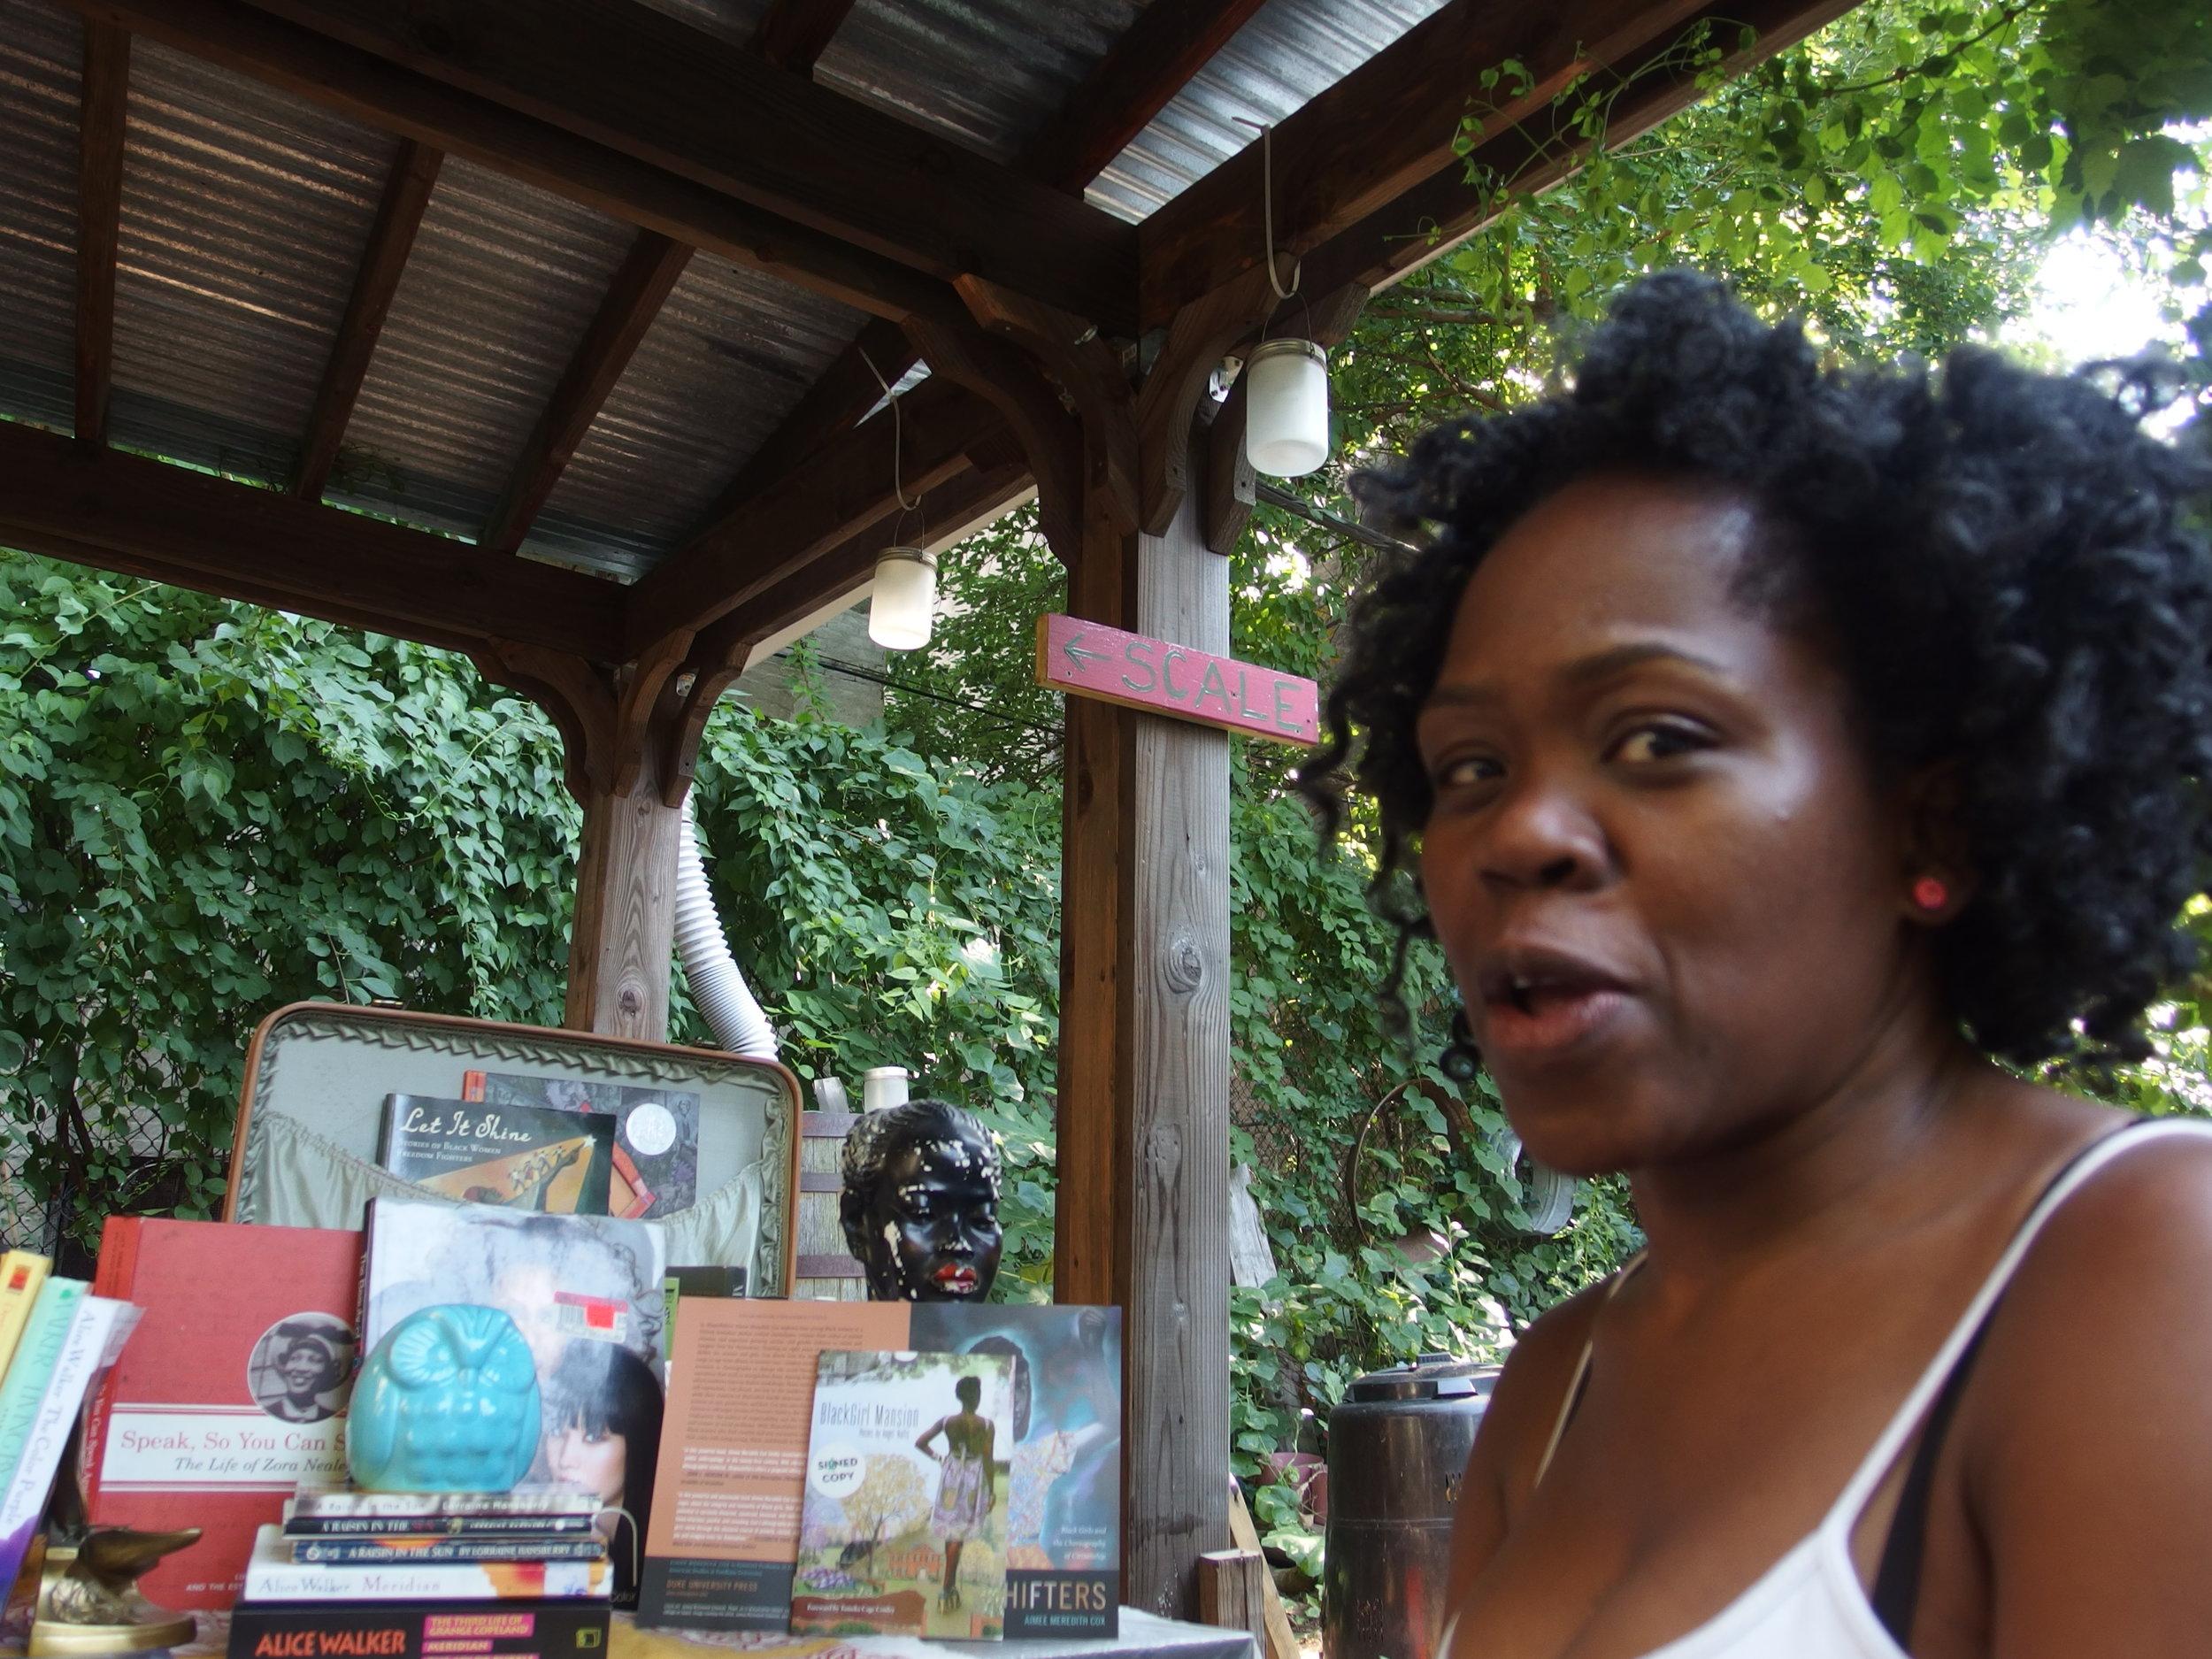 little-free-black-womens-library_20328624164_o.jpg